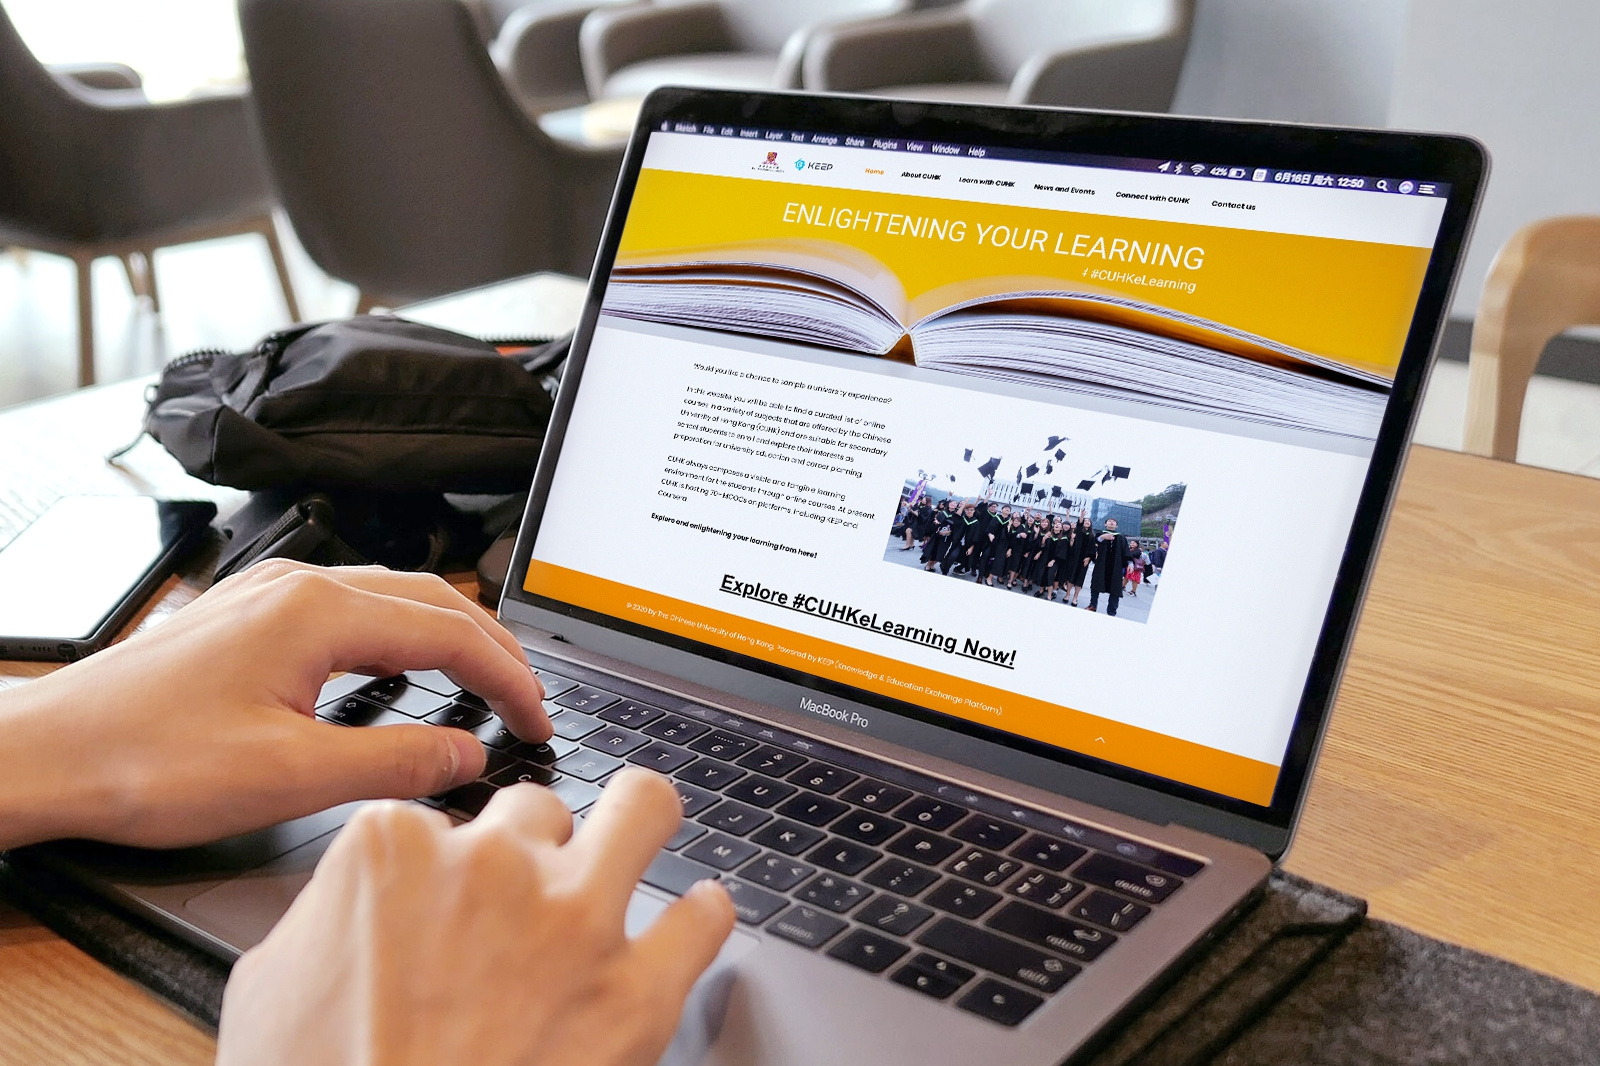 KEEP推出免费网上课程,涵盖STEM(科学、科技、工程及数学)及医学等不同学科。